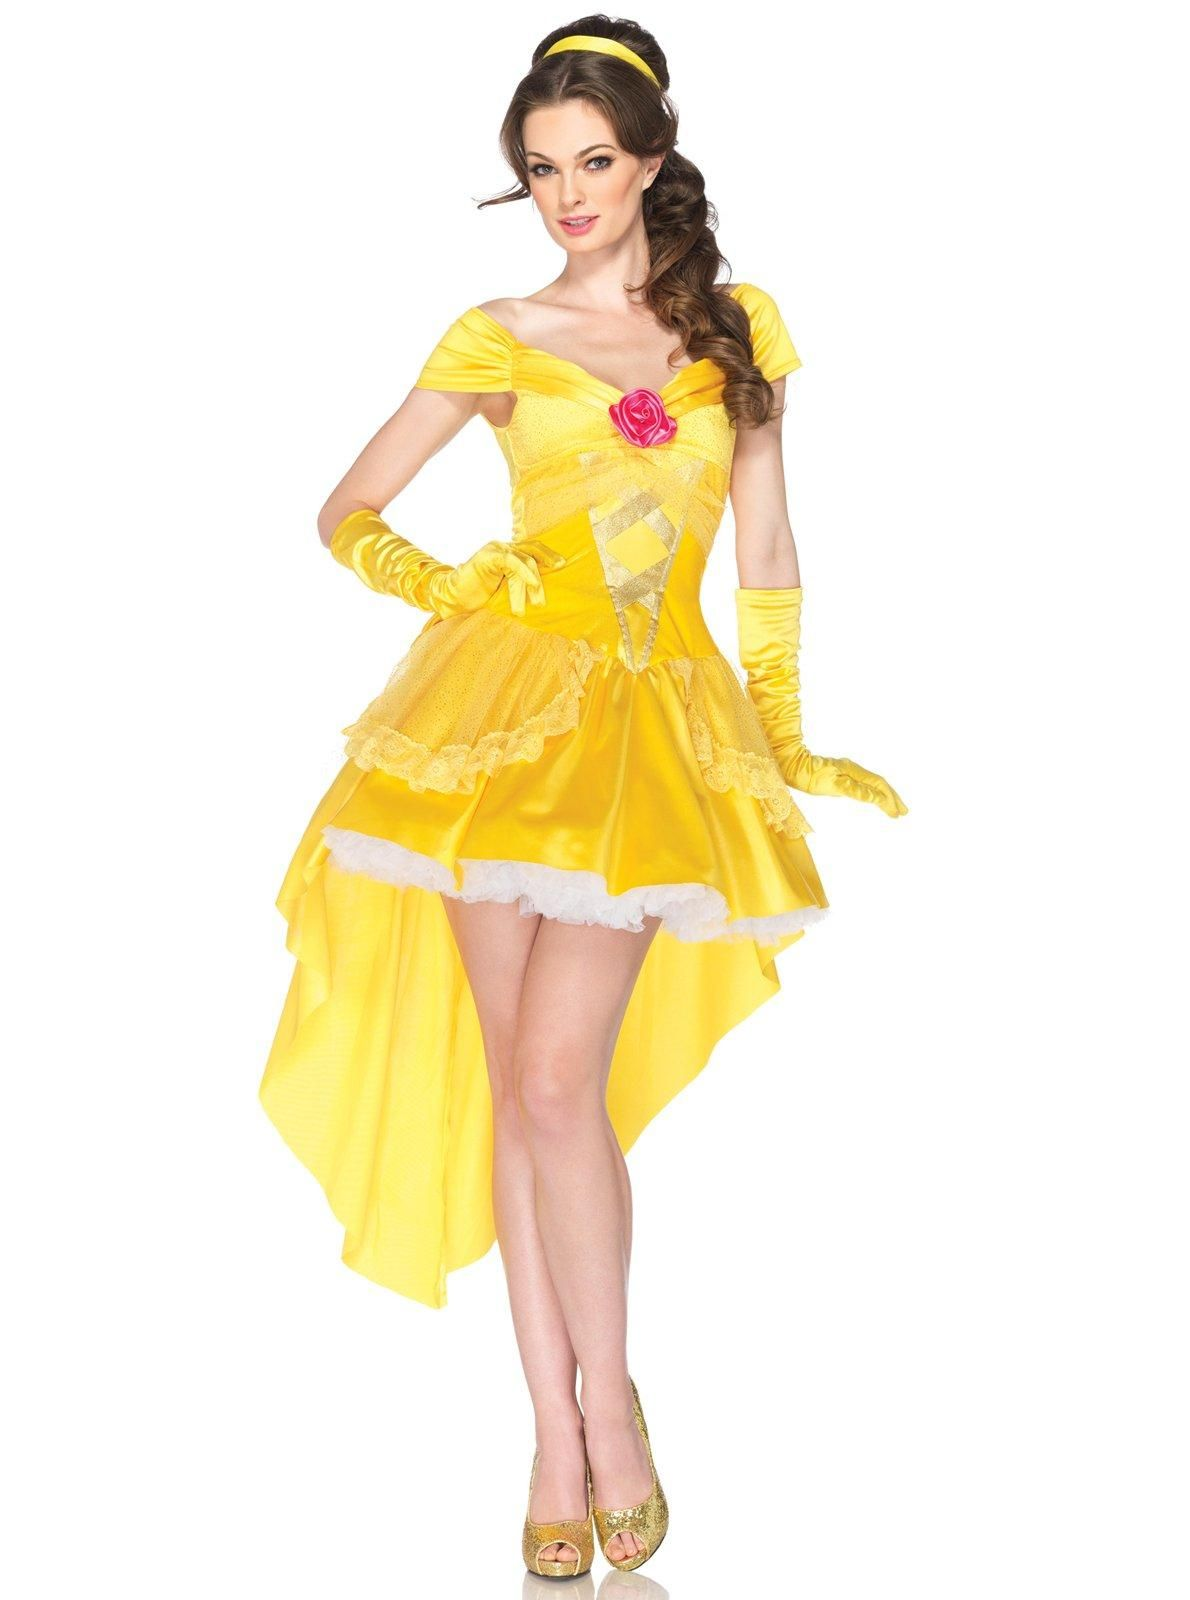 Disney princess gowns for adults - Disney Princesses Enchanting Belle Adult Costume